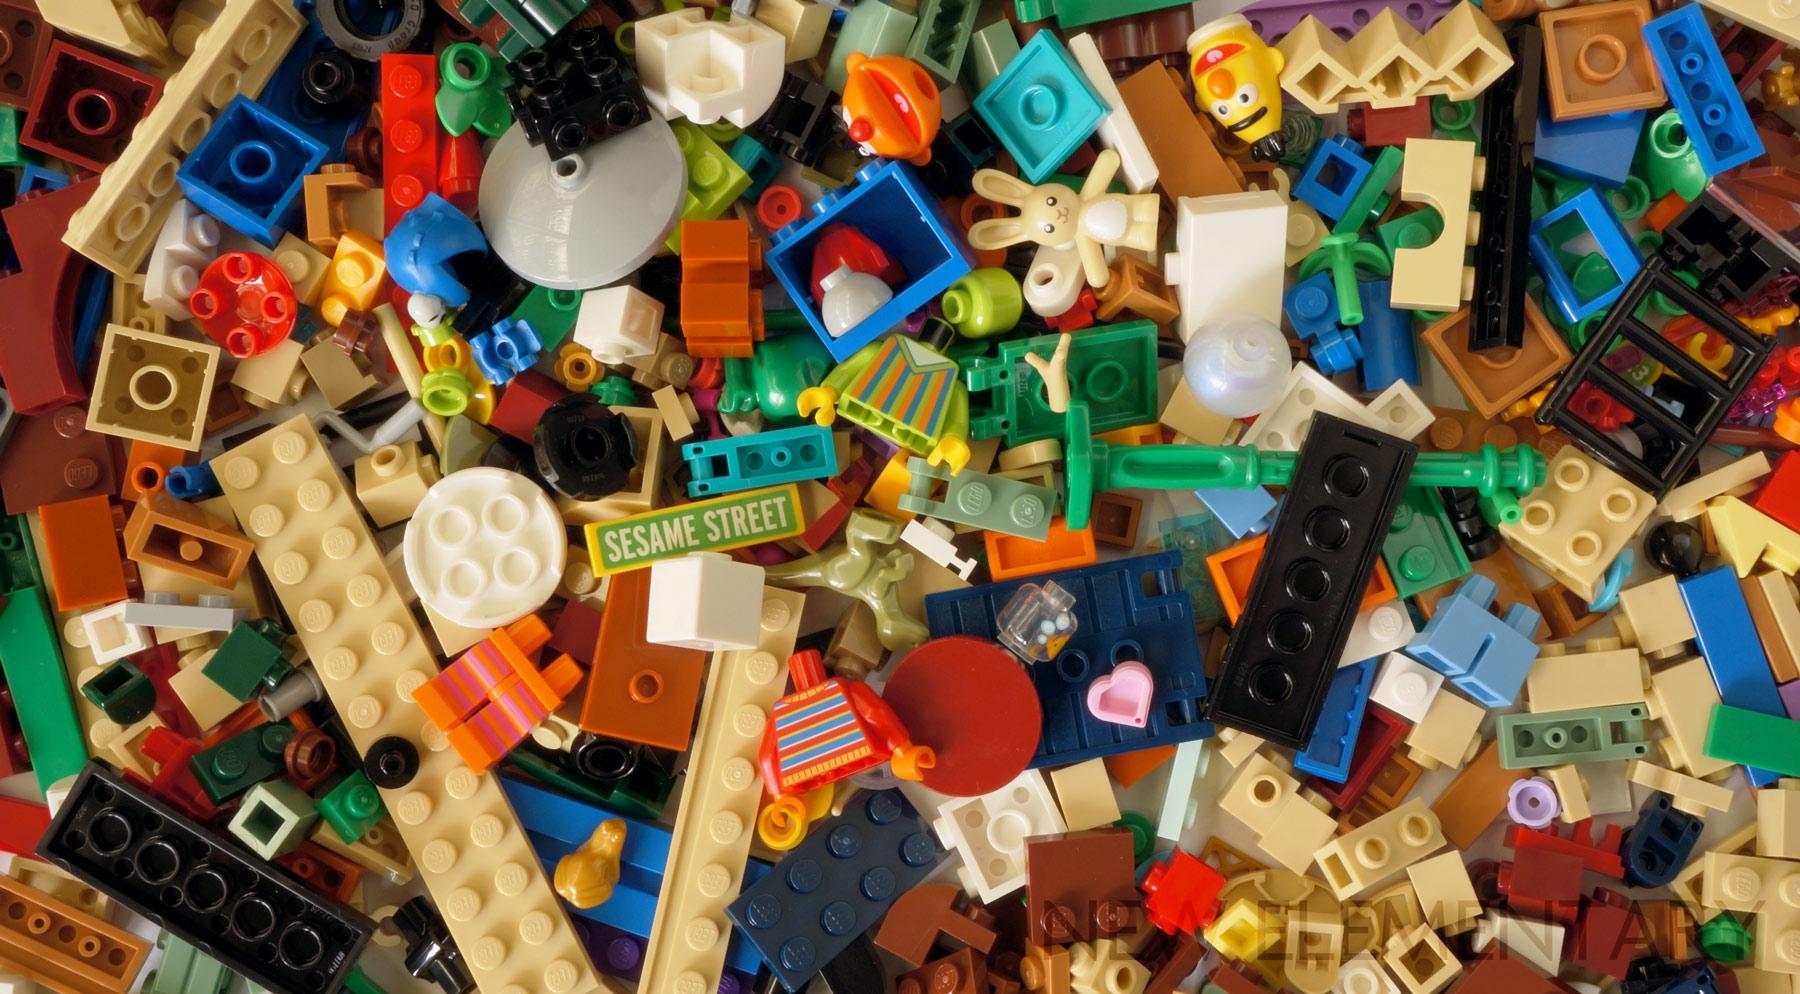 LEGO LOT OF 500 NEW DARK PURPLE 1 X 1 DOT DOT PLATES PIECES